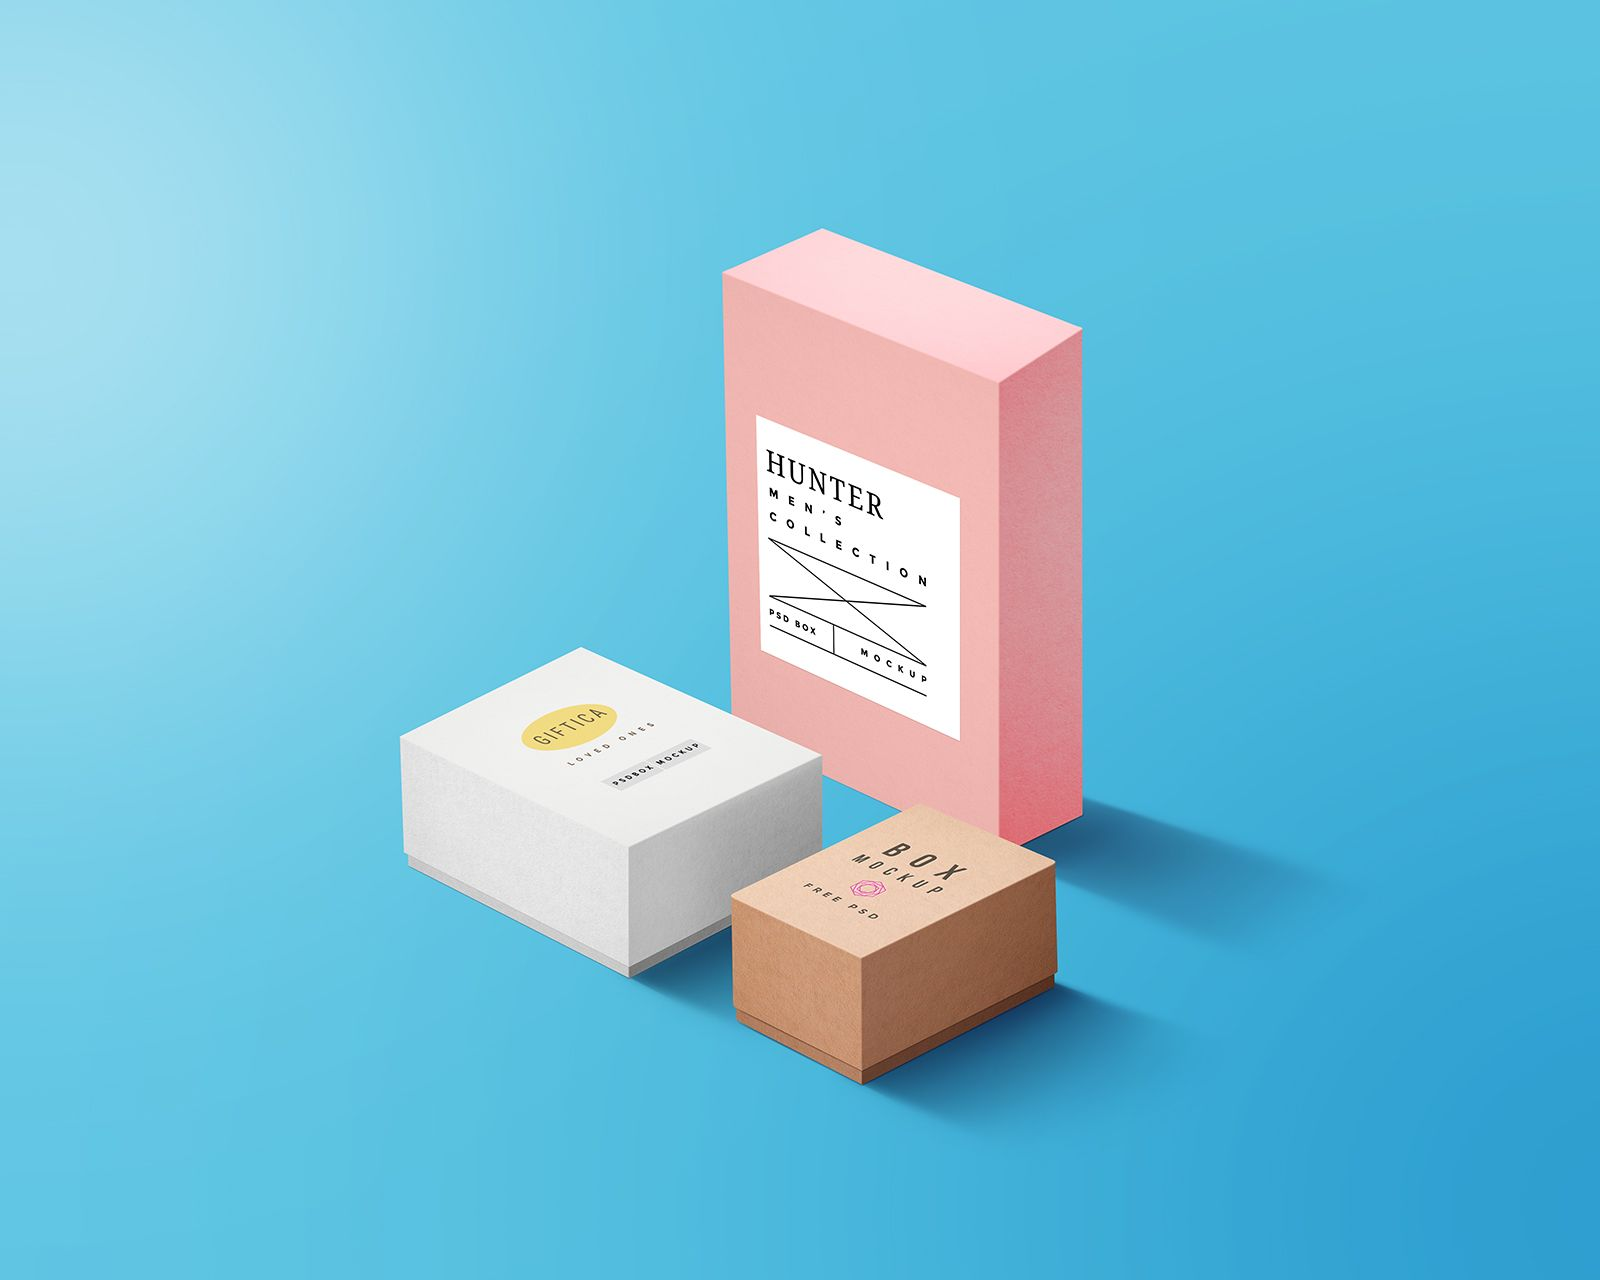 Boxes Packaging Mockup Psd Packaging Mockup Free Packaging Mockup Mockup Psd